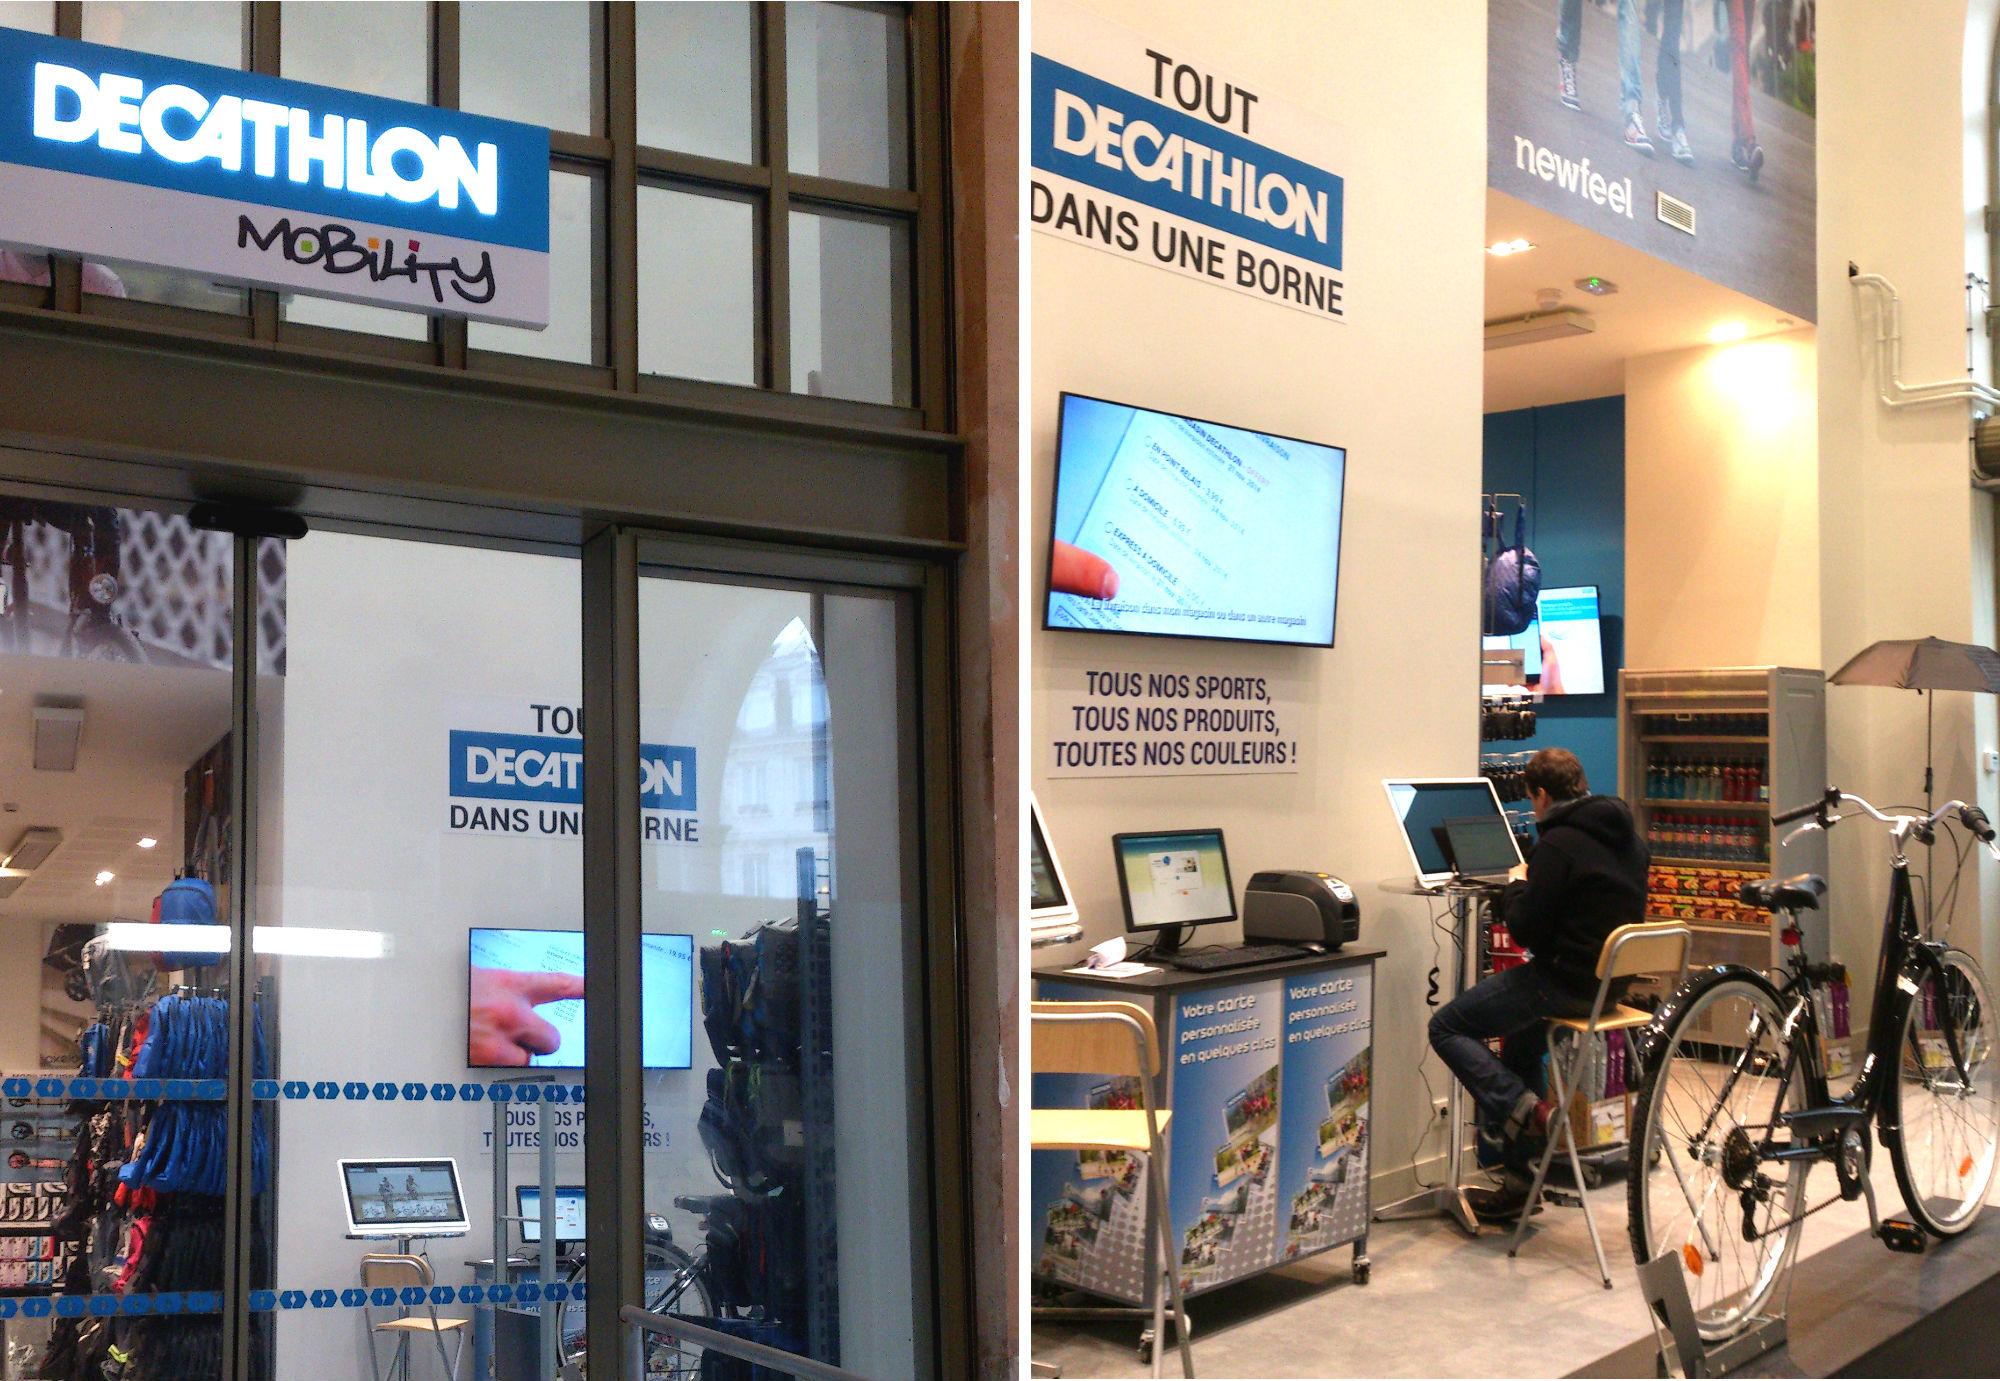 Meuble De Cuisine Decathlon decathlon mobility, nouvelle enseigne en gare